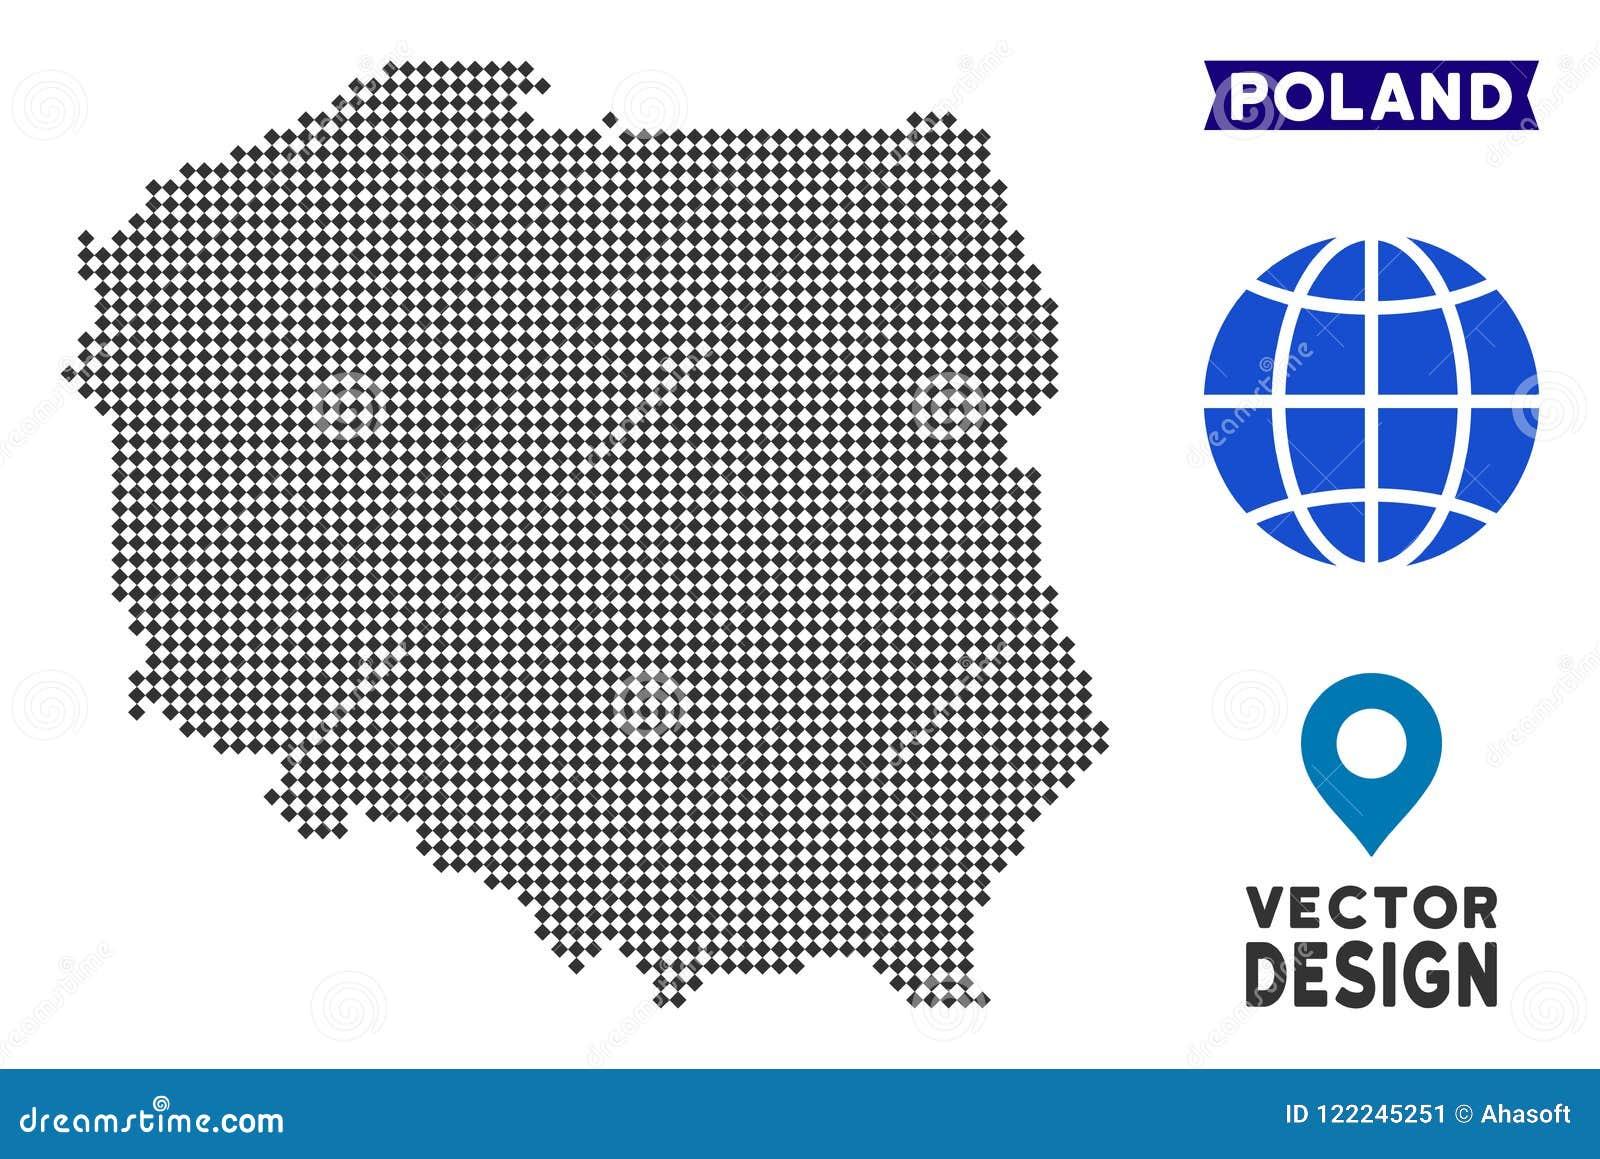 Dot Poland Map